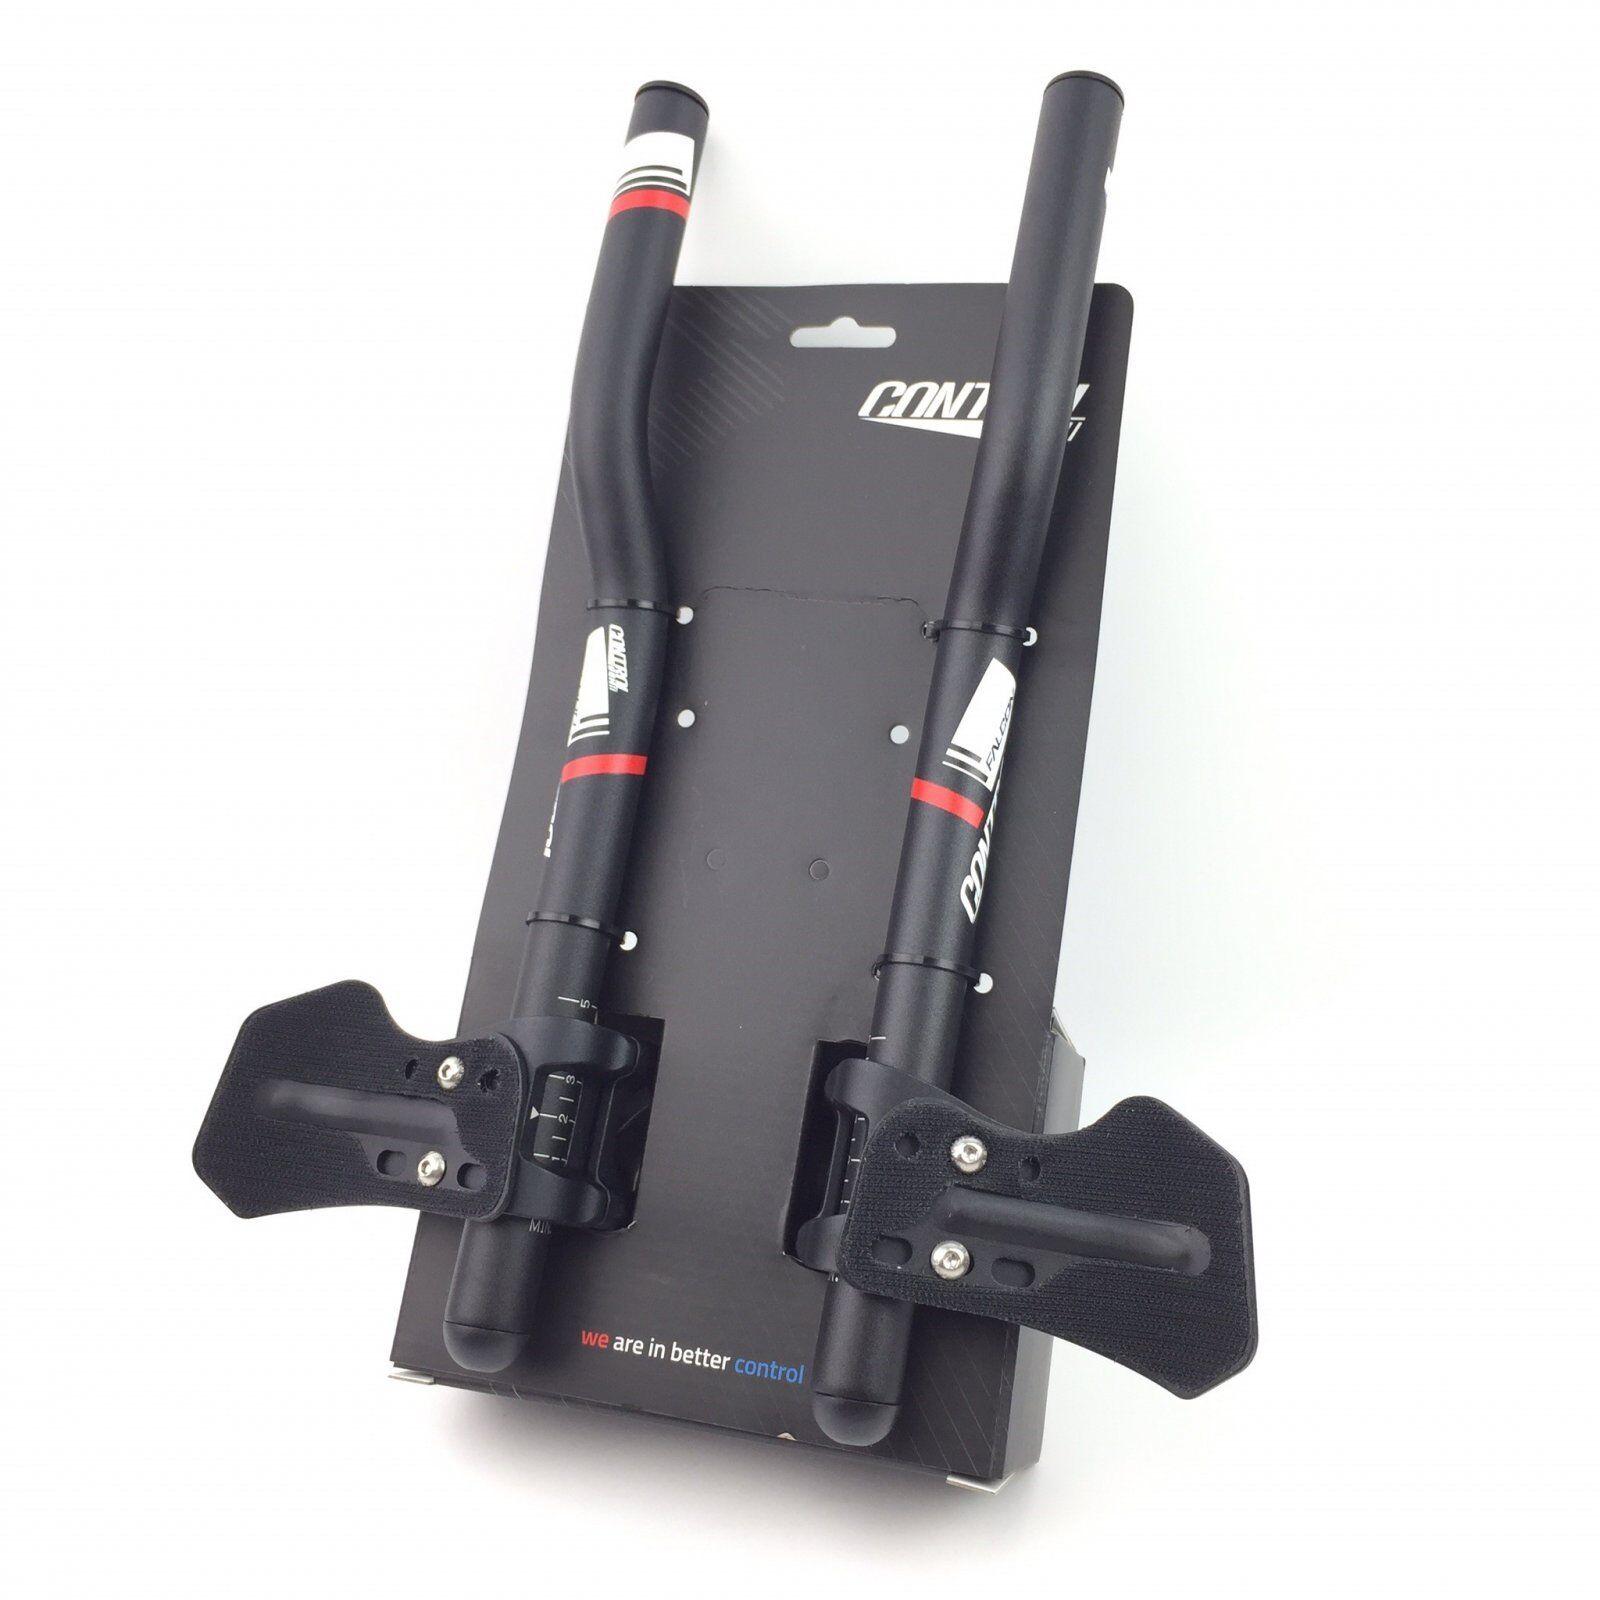 Controltech Falcon TTH15 Bike Adjustable S-Bend Clip-On 31.8mm TT Bar Handlebar